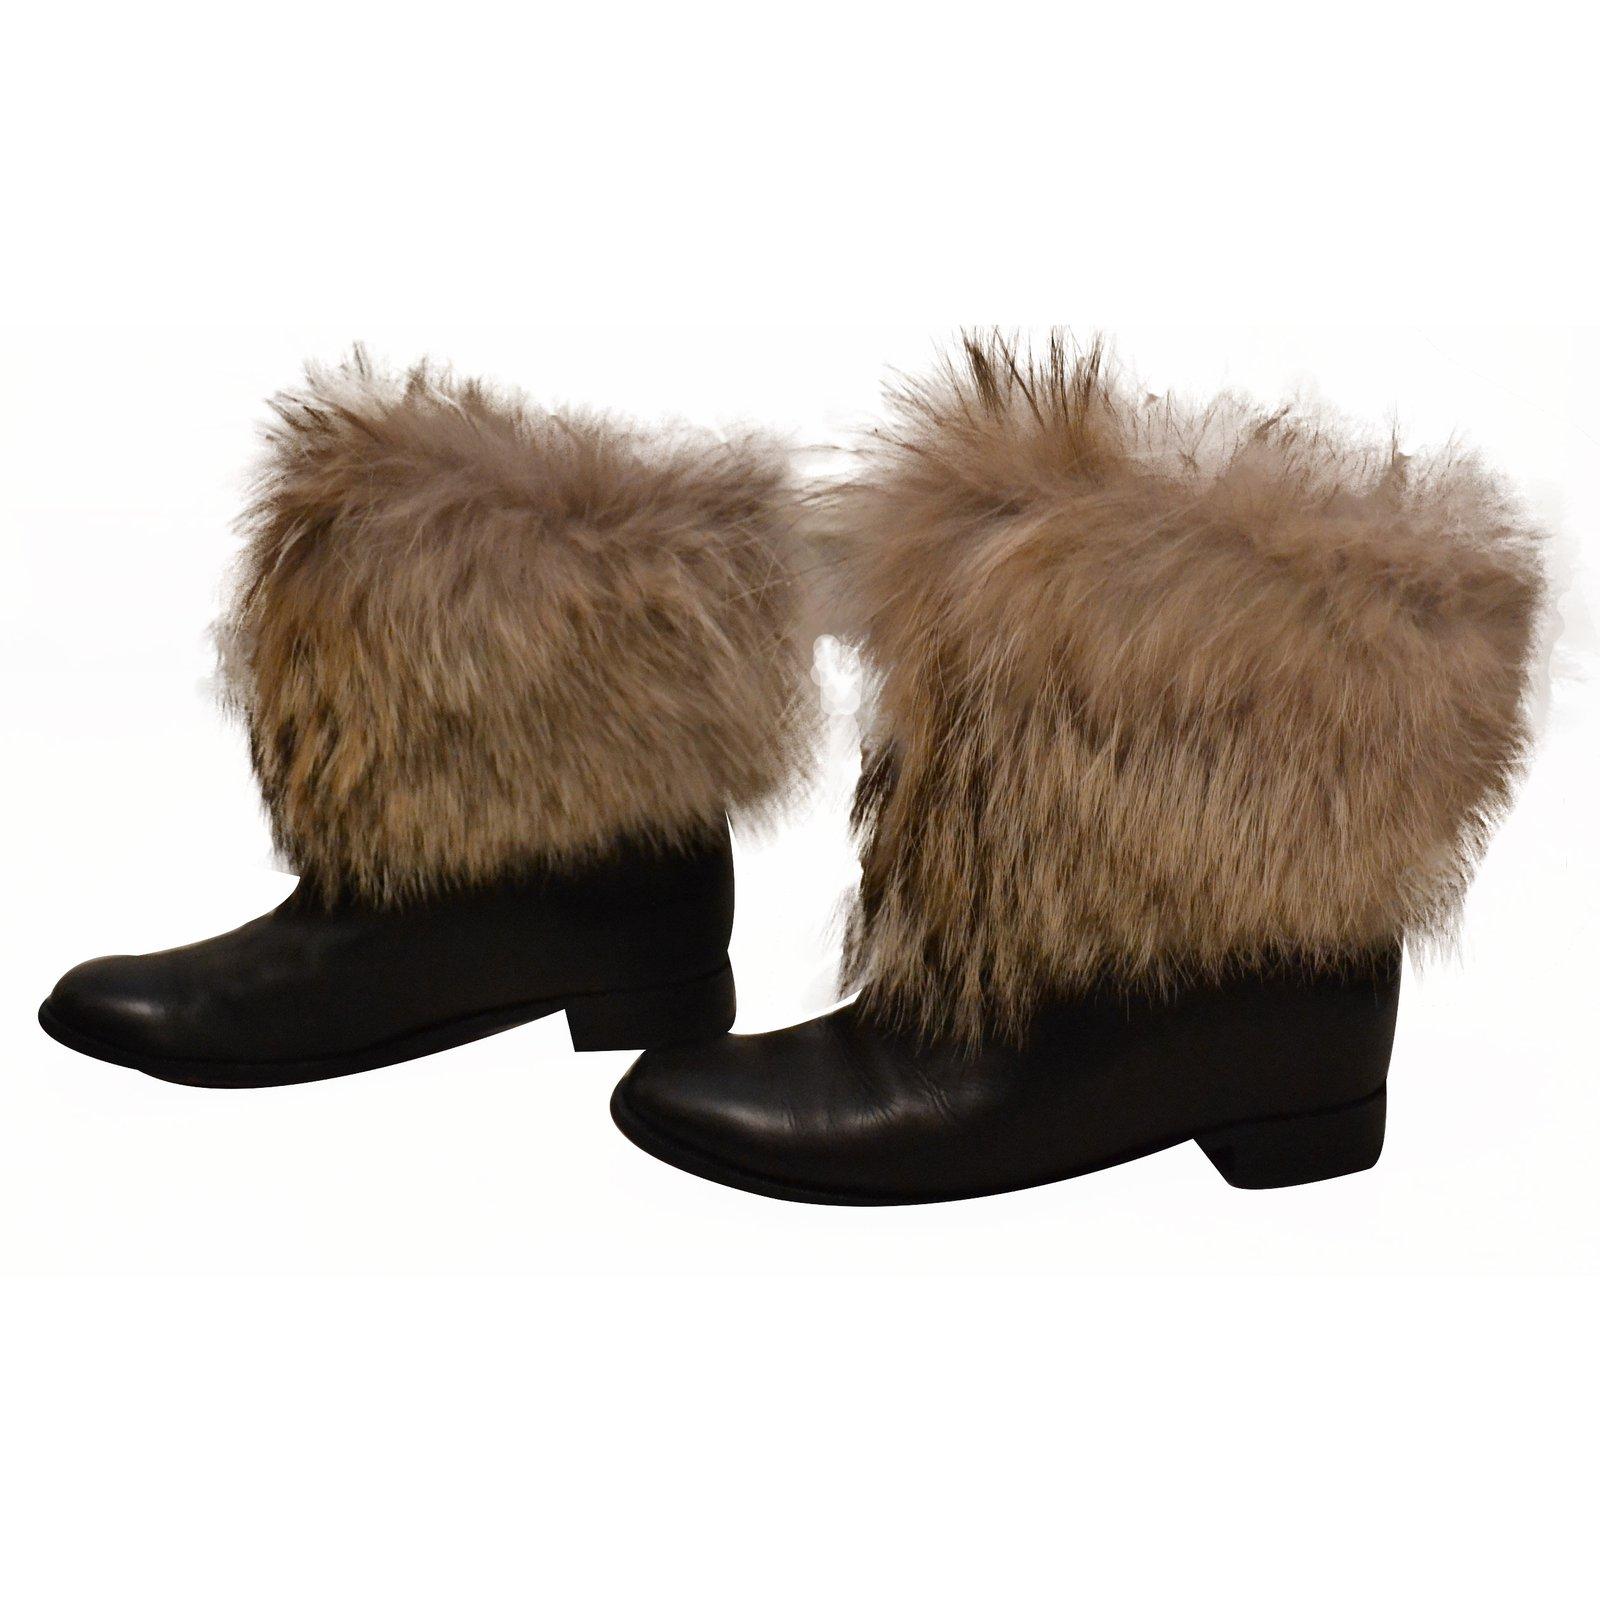 5184c6e7ae6 Christian Louboutin Fox fur boots Boots Leather Black ref.17302 ...